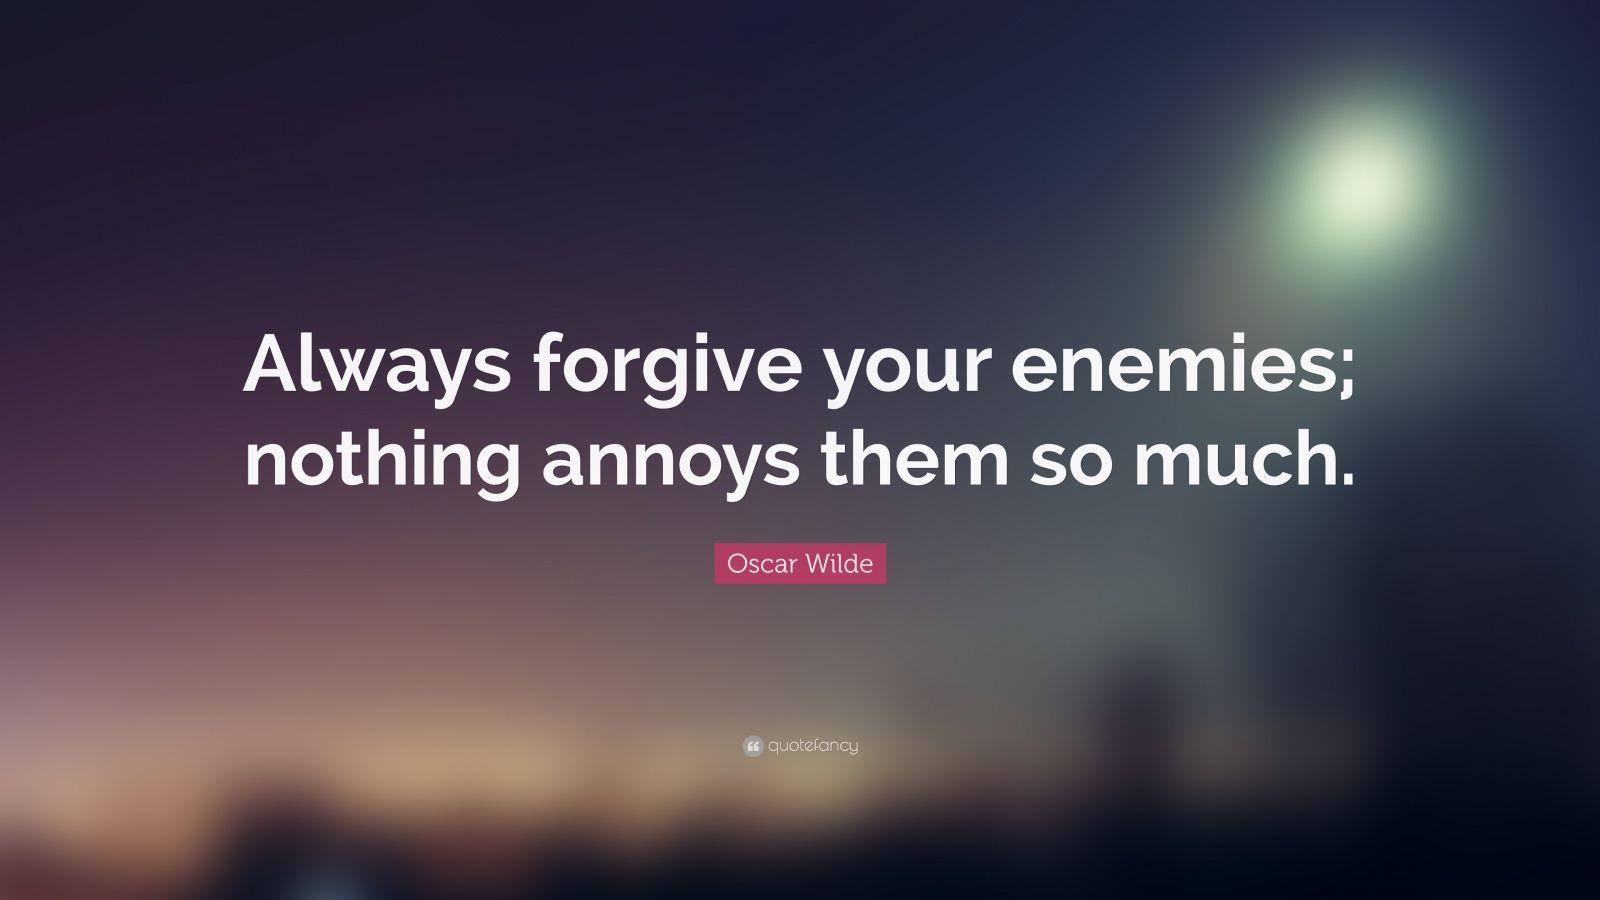 How Do I Respond to My Enemies?